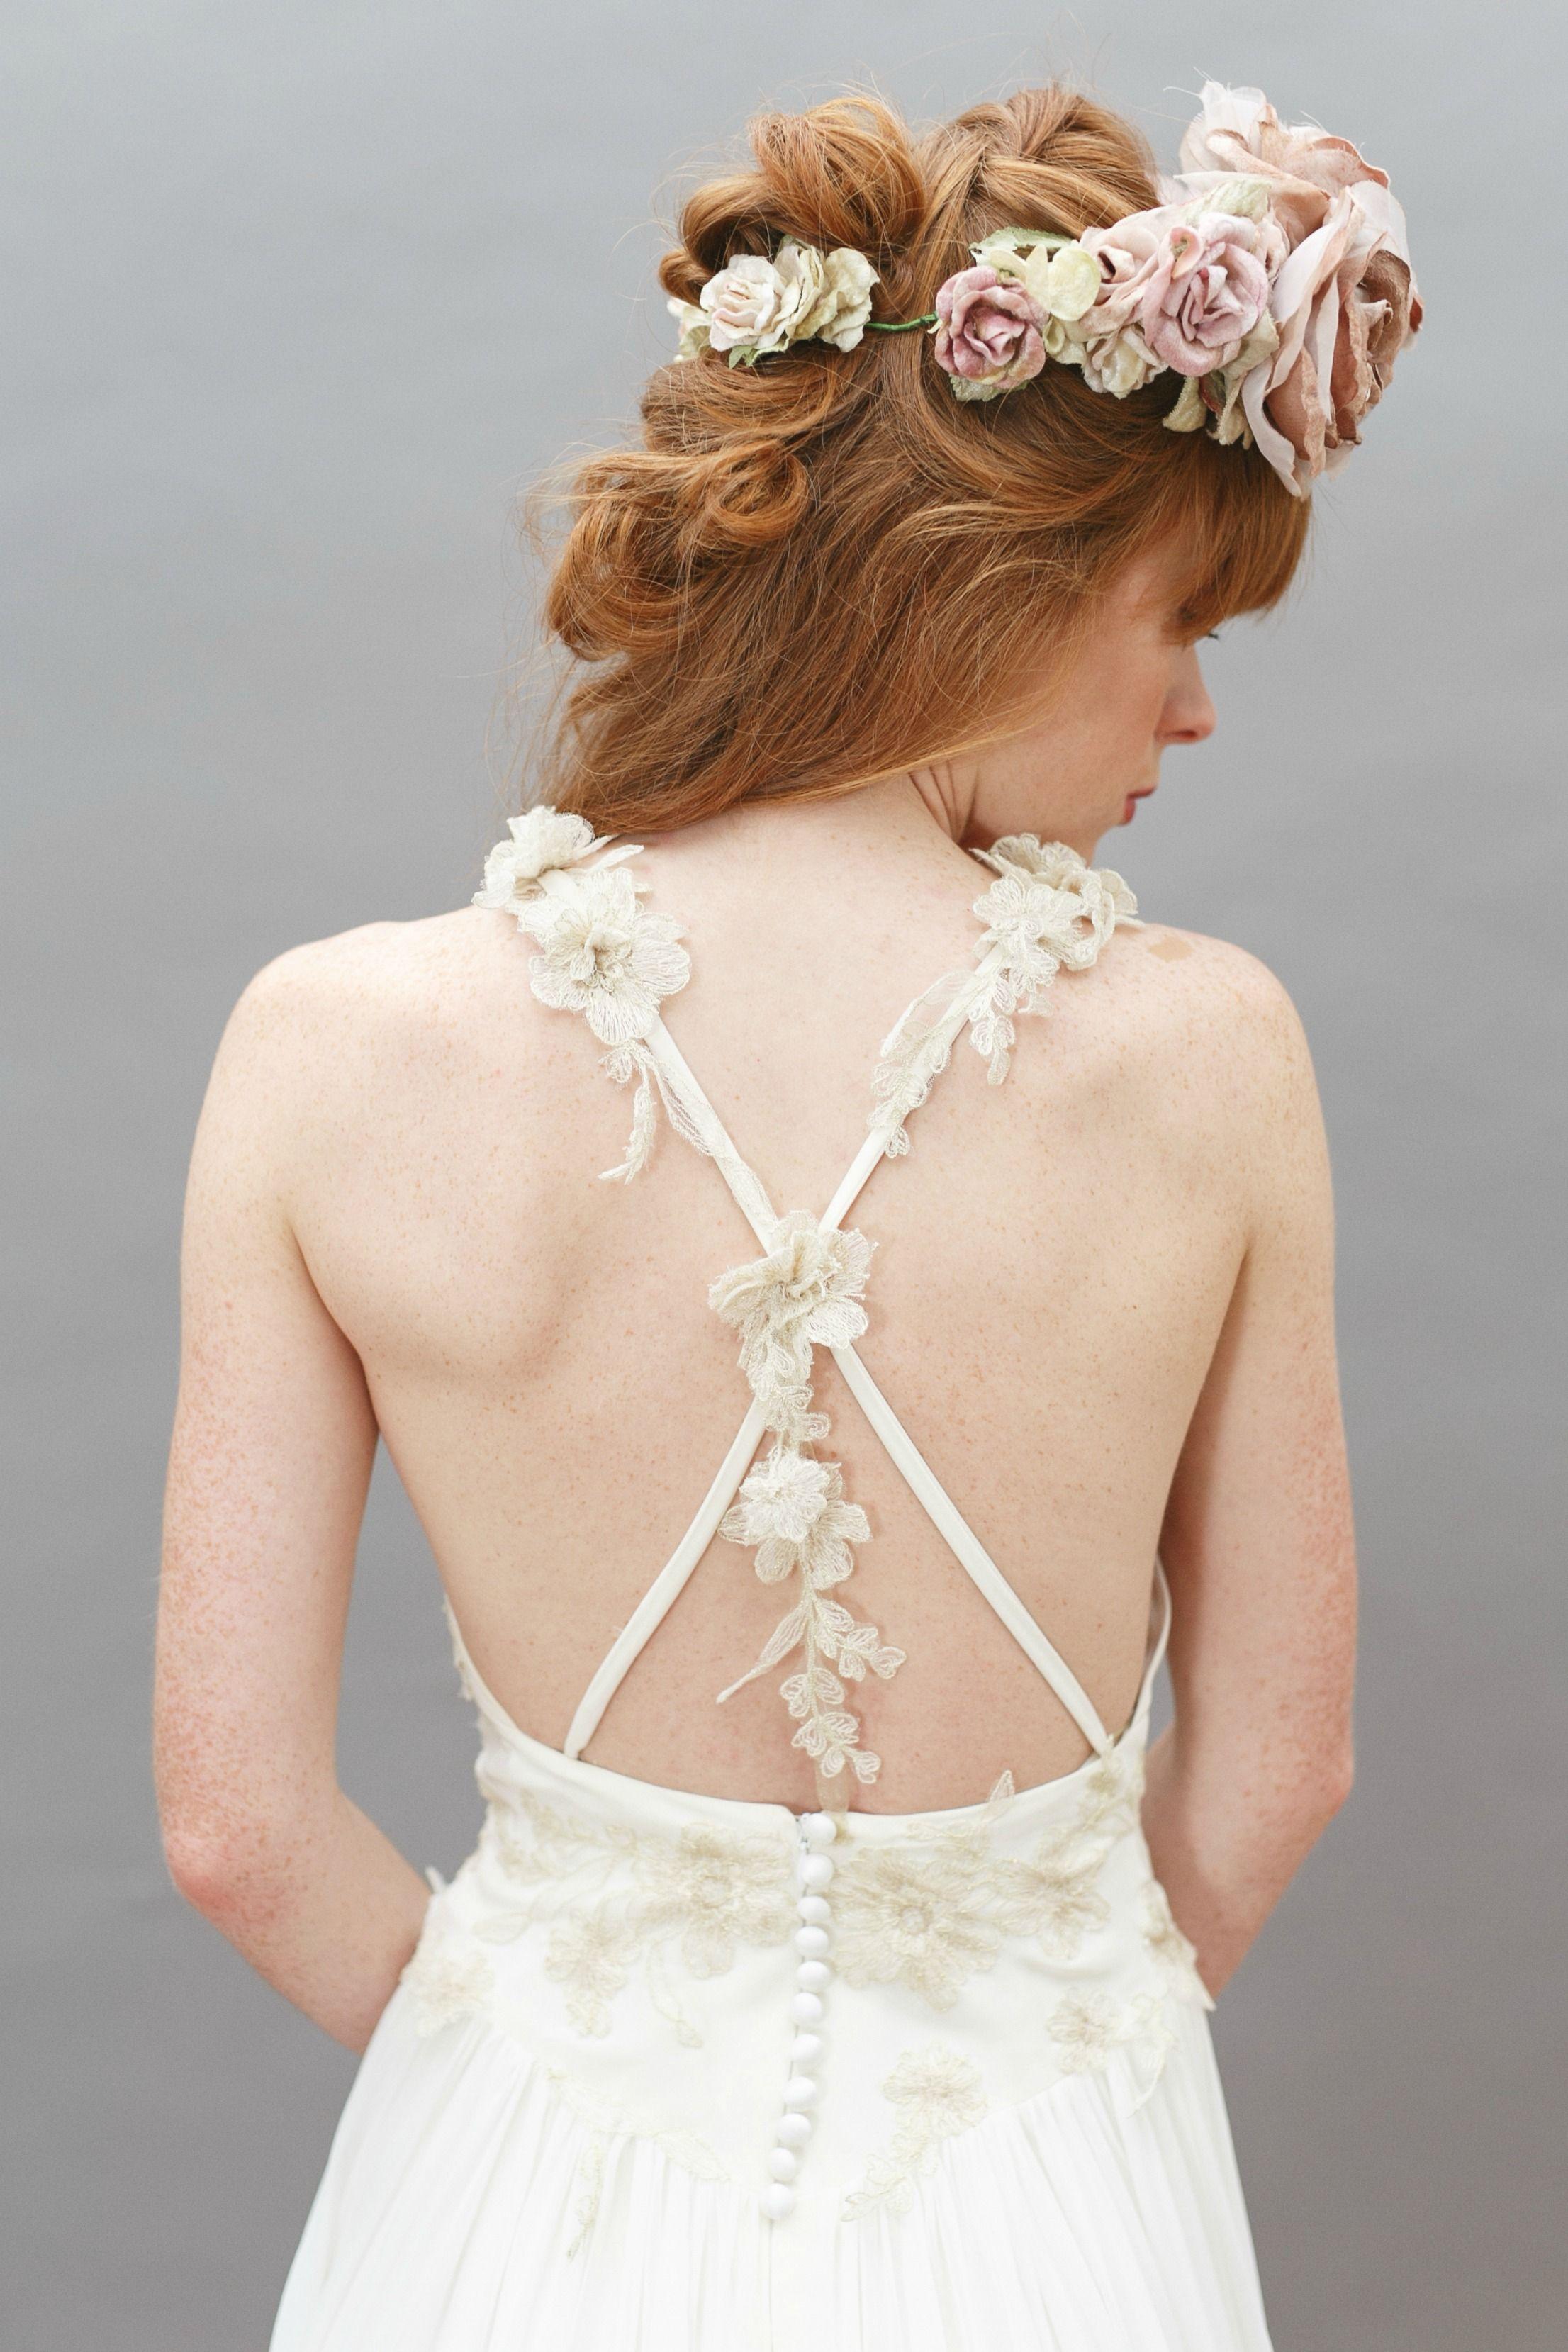 The fashion pack presents u dana bolton ethereal and weddings